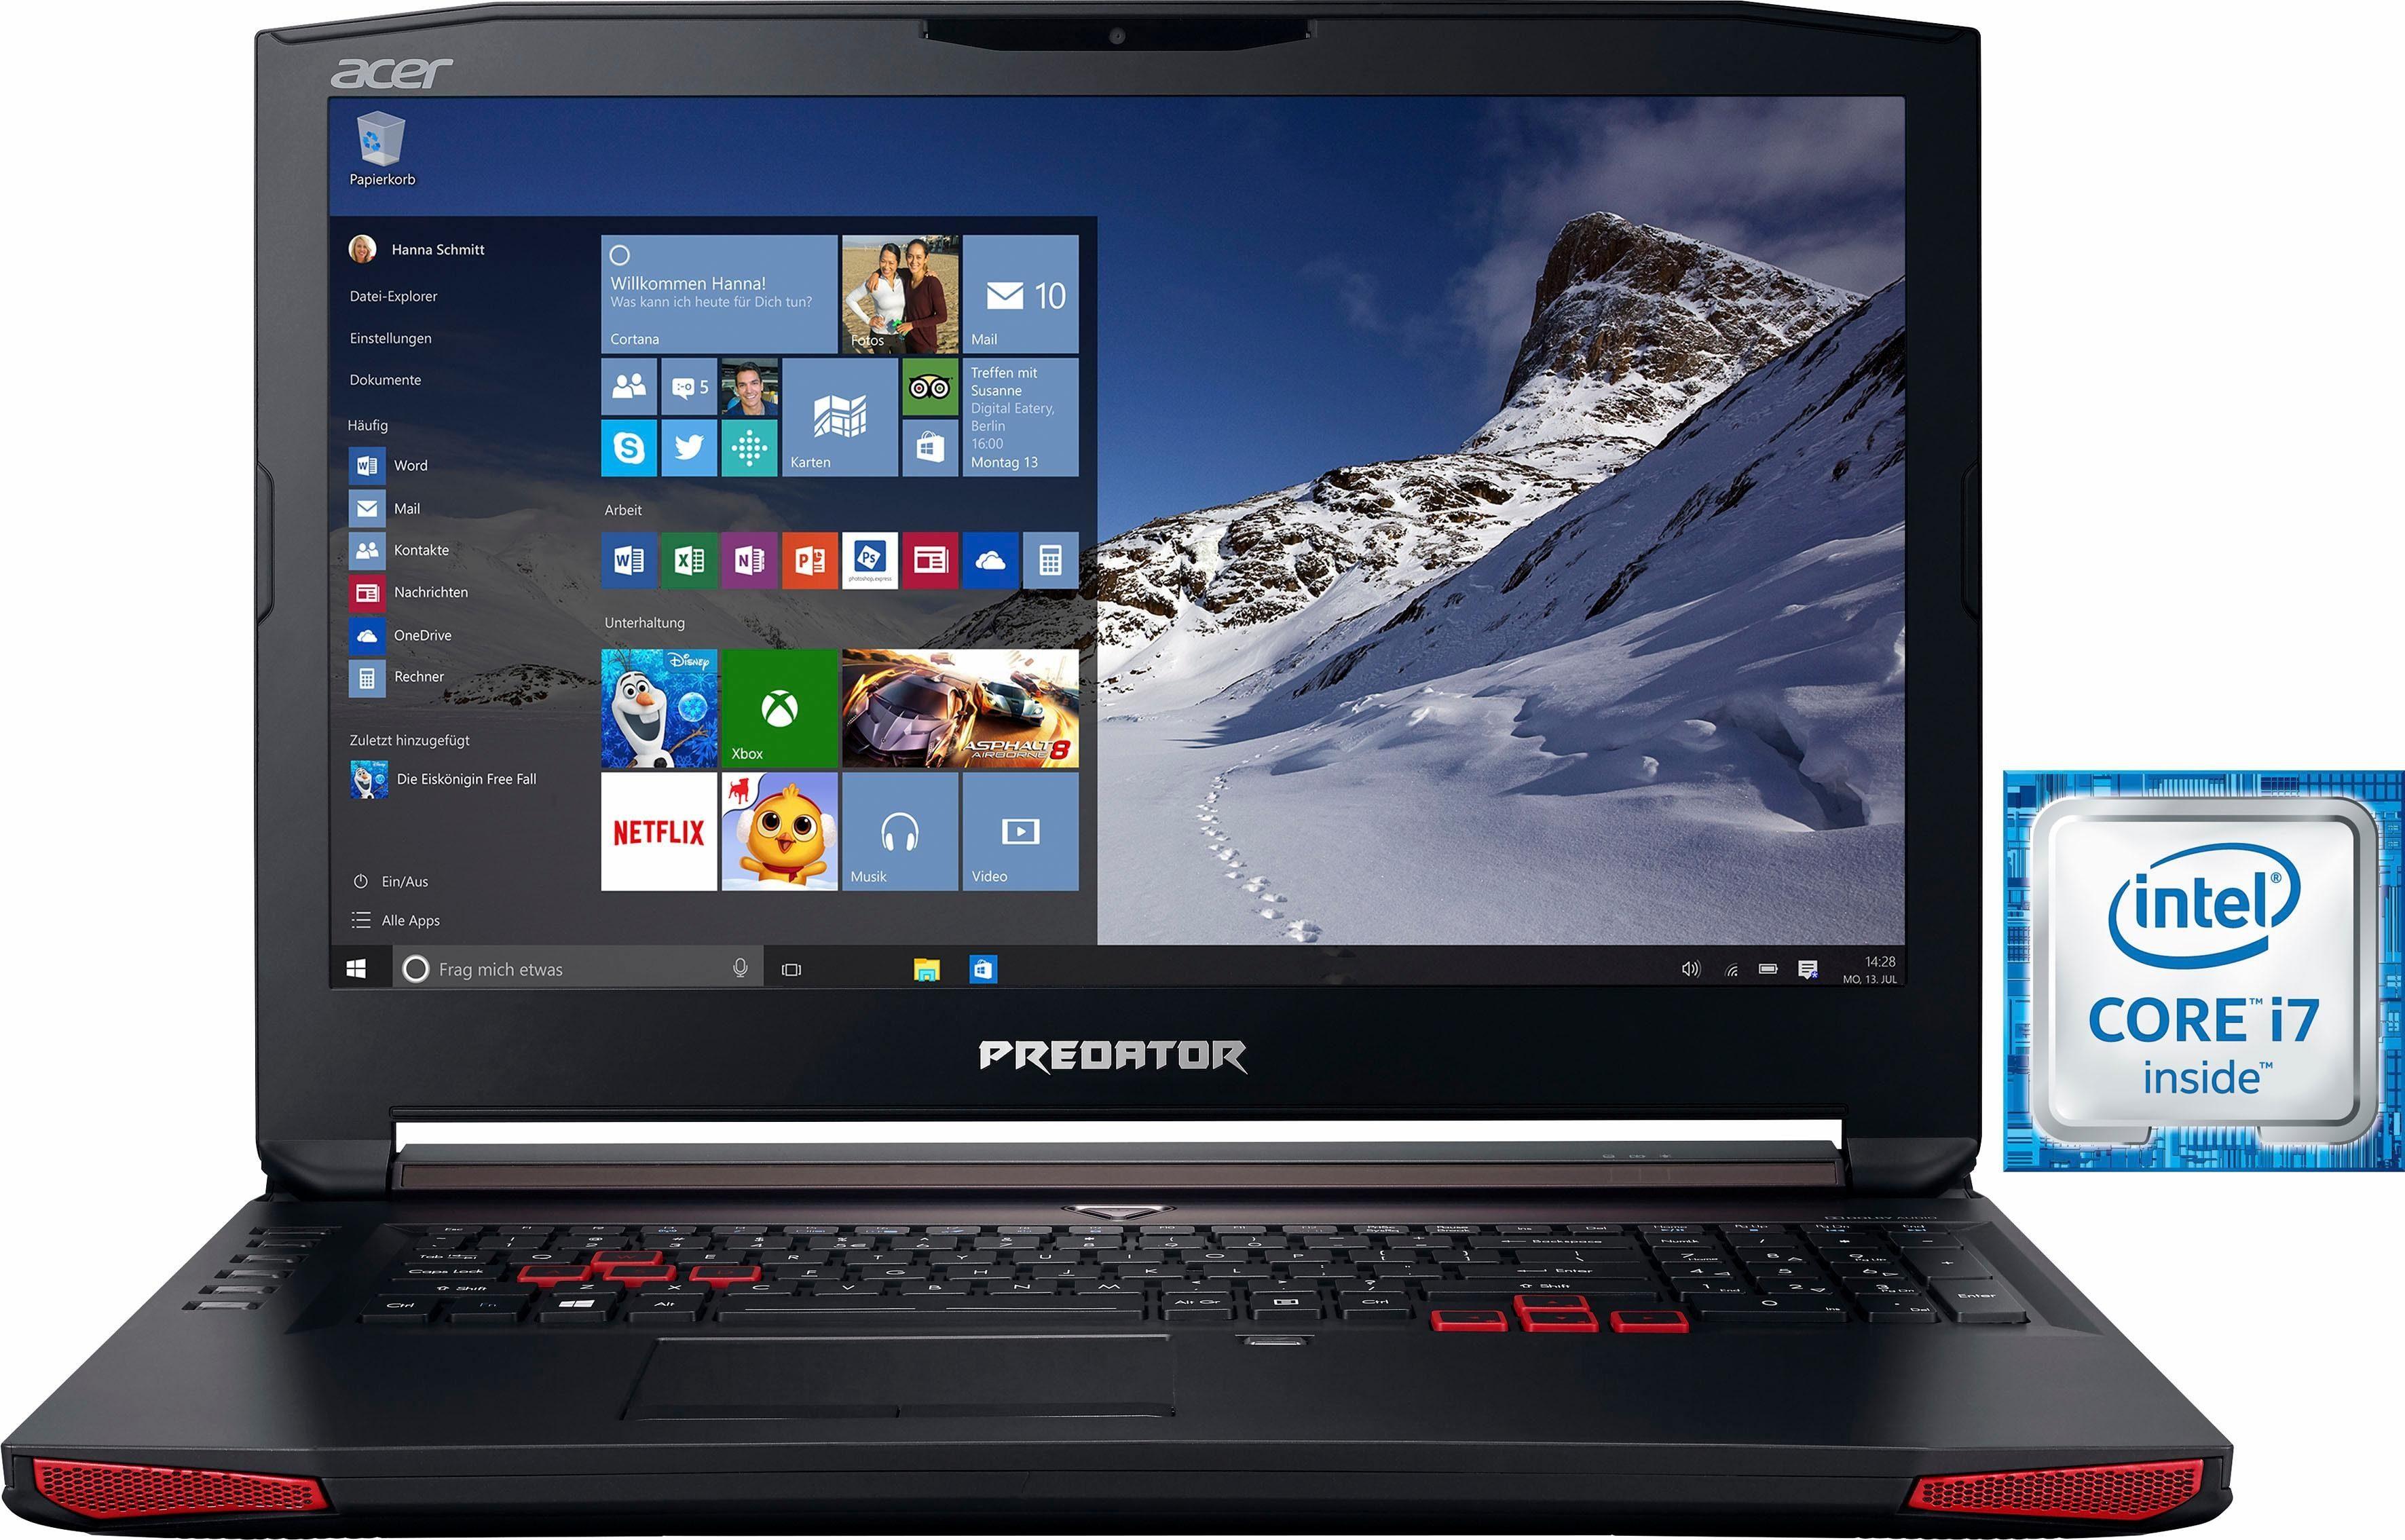 Acer Predator G5-793-7108 Notebook, Intel® Core™ i7, 43,9 cm (17,3 Zoll), 1256 GB Speicher